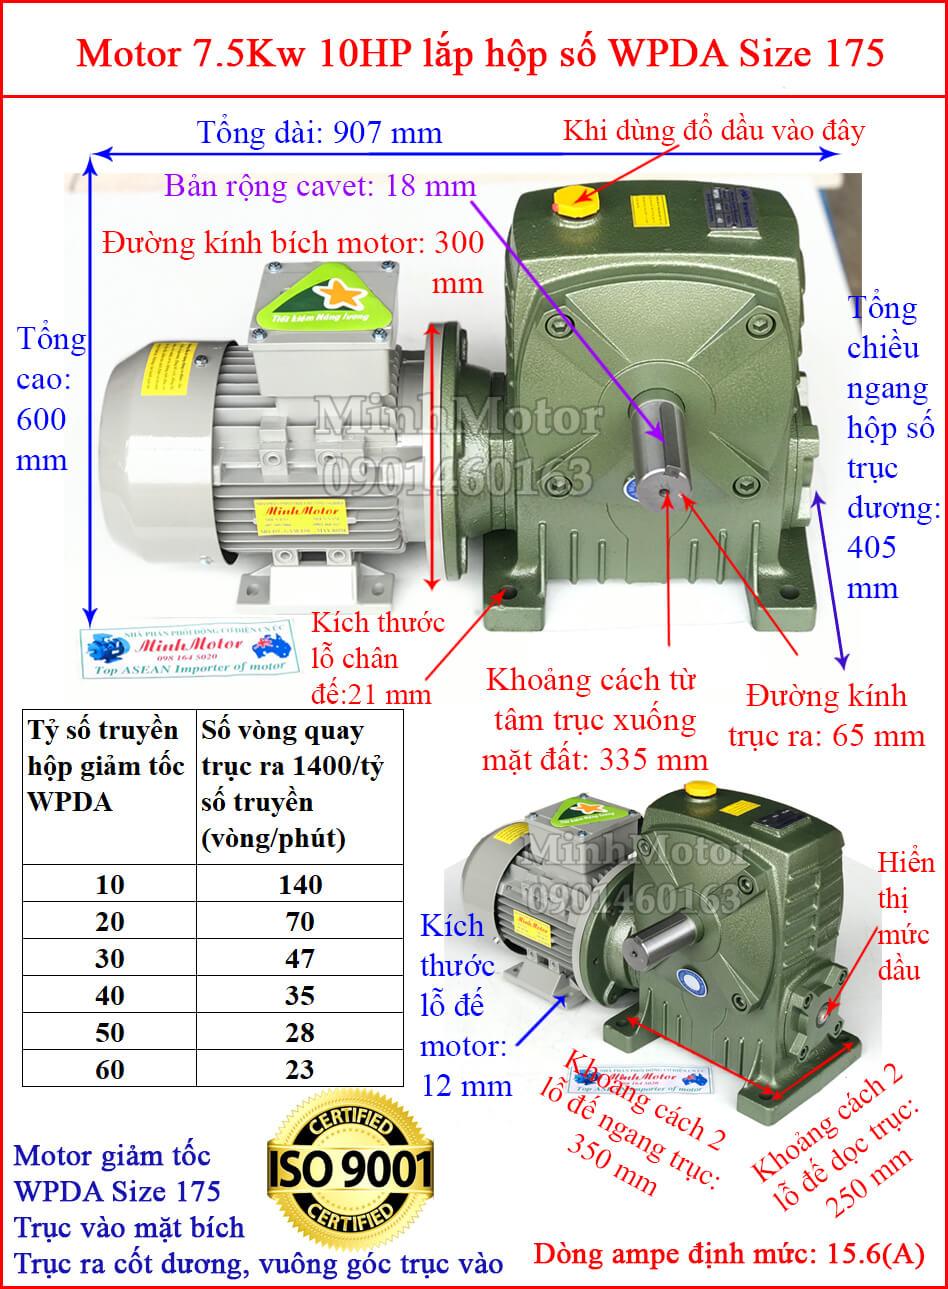 Hộp số WPDA size 175 liền motor